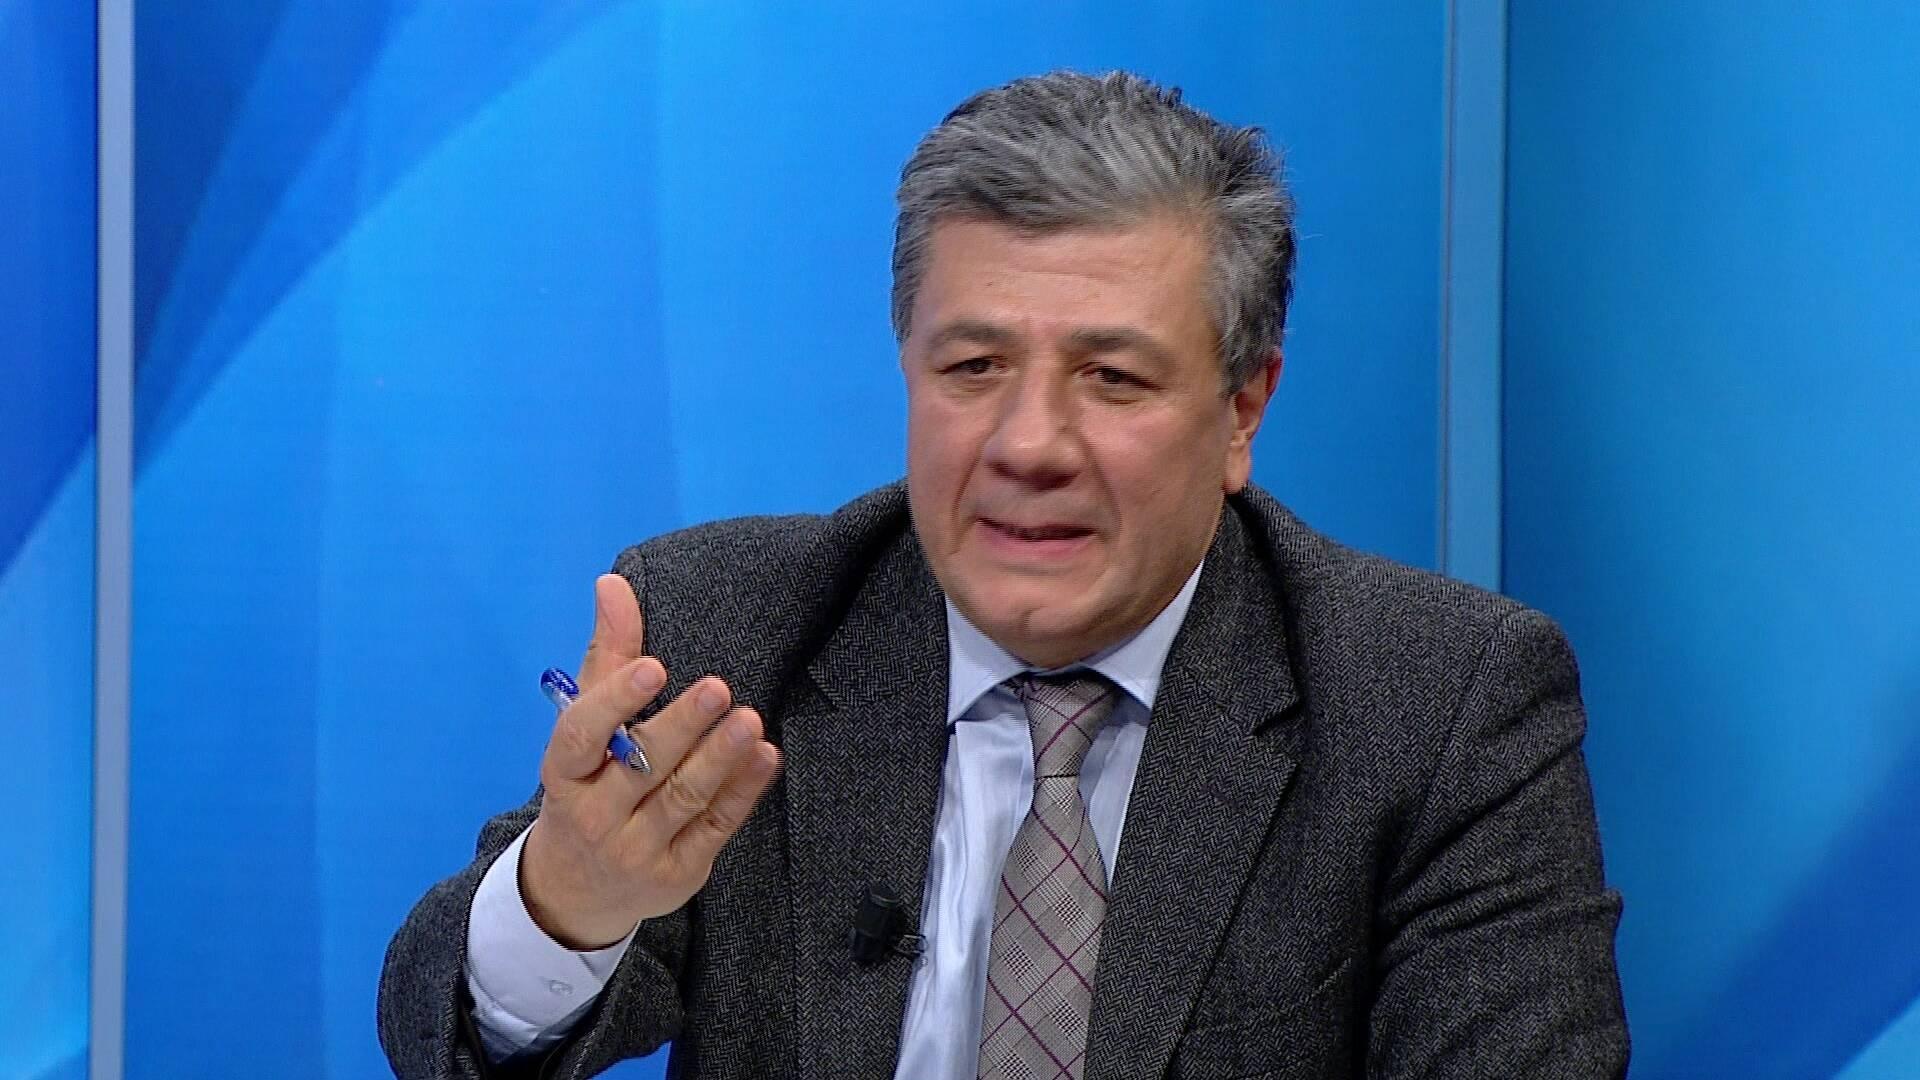 27.11.2014 / Mustafa Balbay